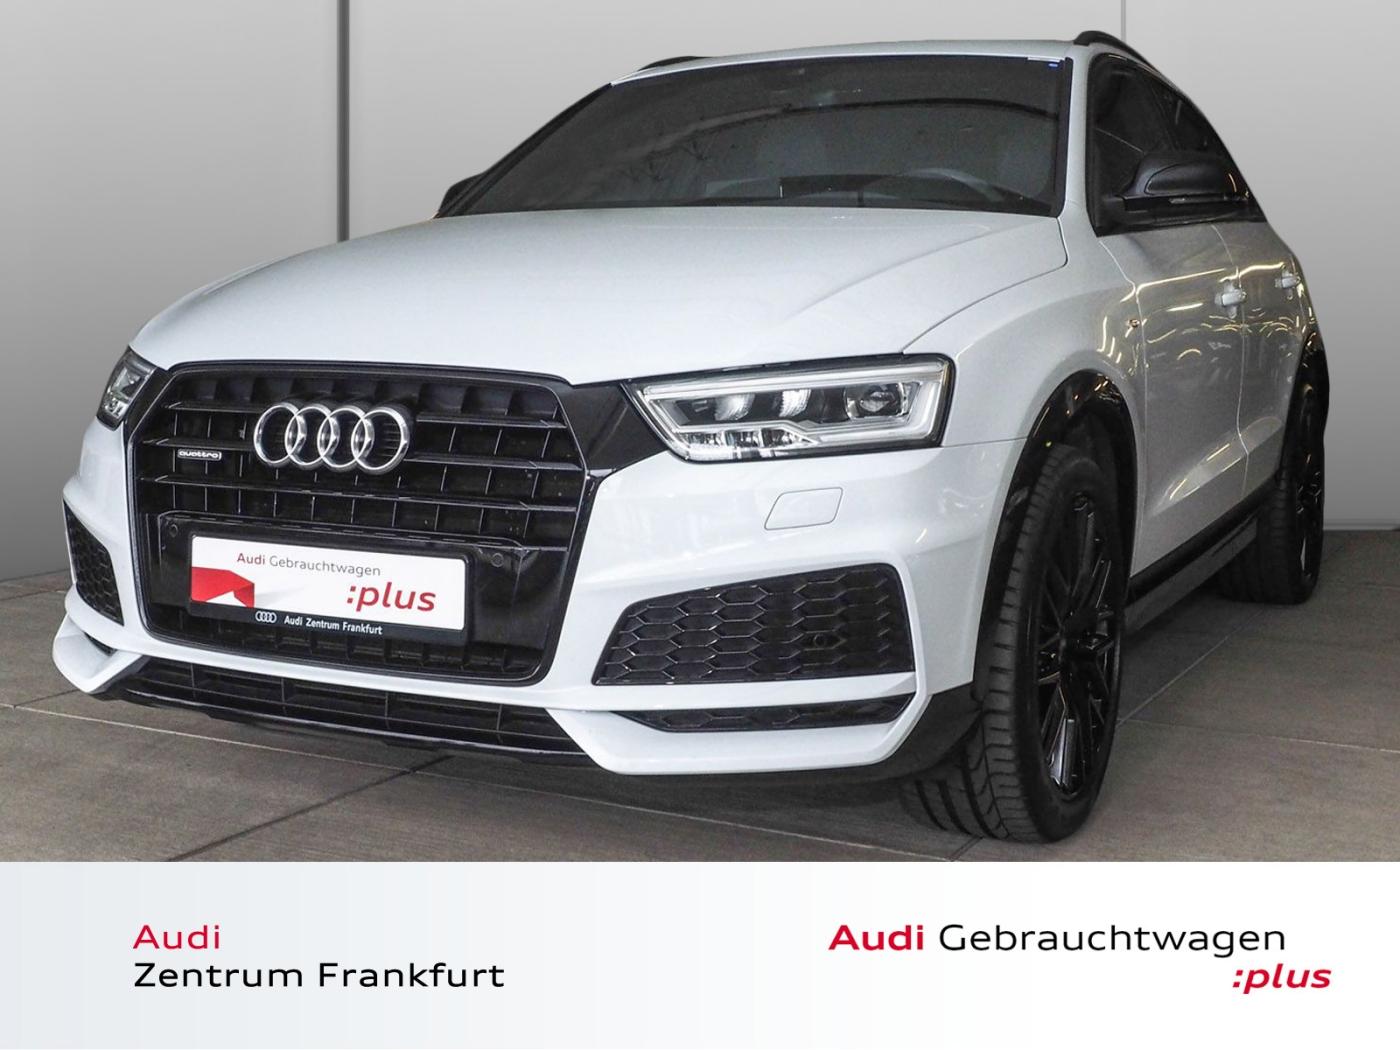 Audi Q3 2.0 TDI s tronic S line Pano BOSE Navi LED S-, Jahr 2017, Diesel